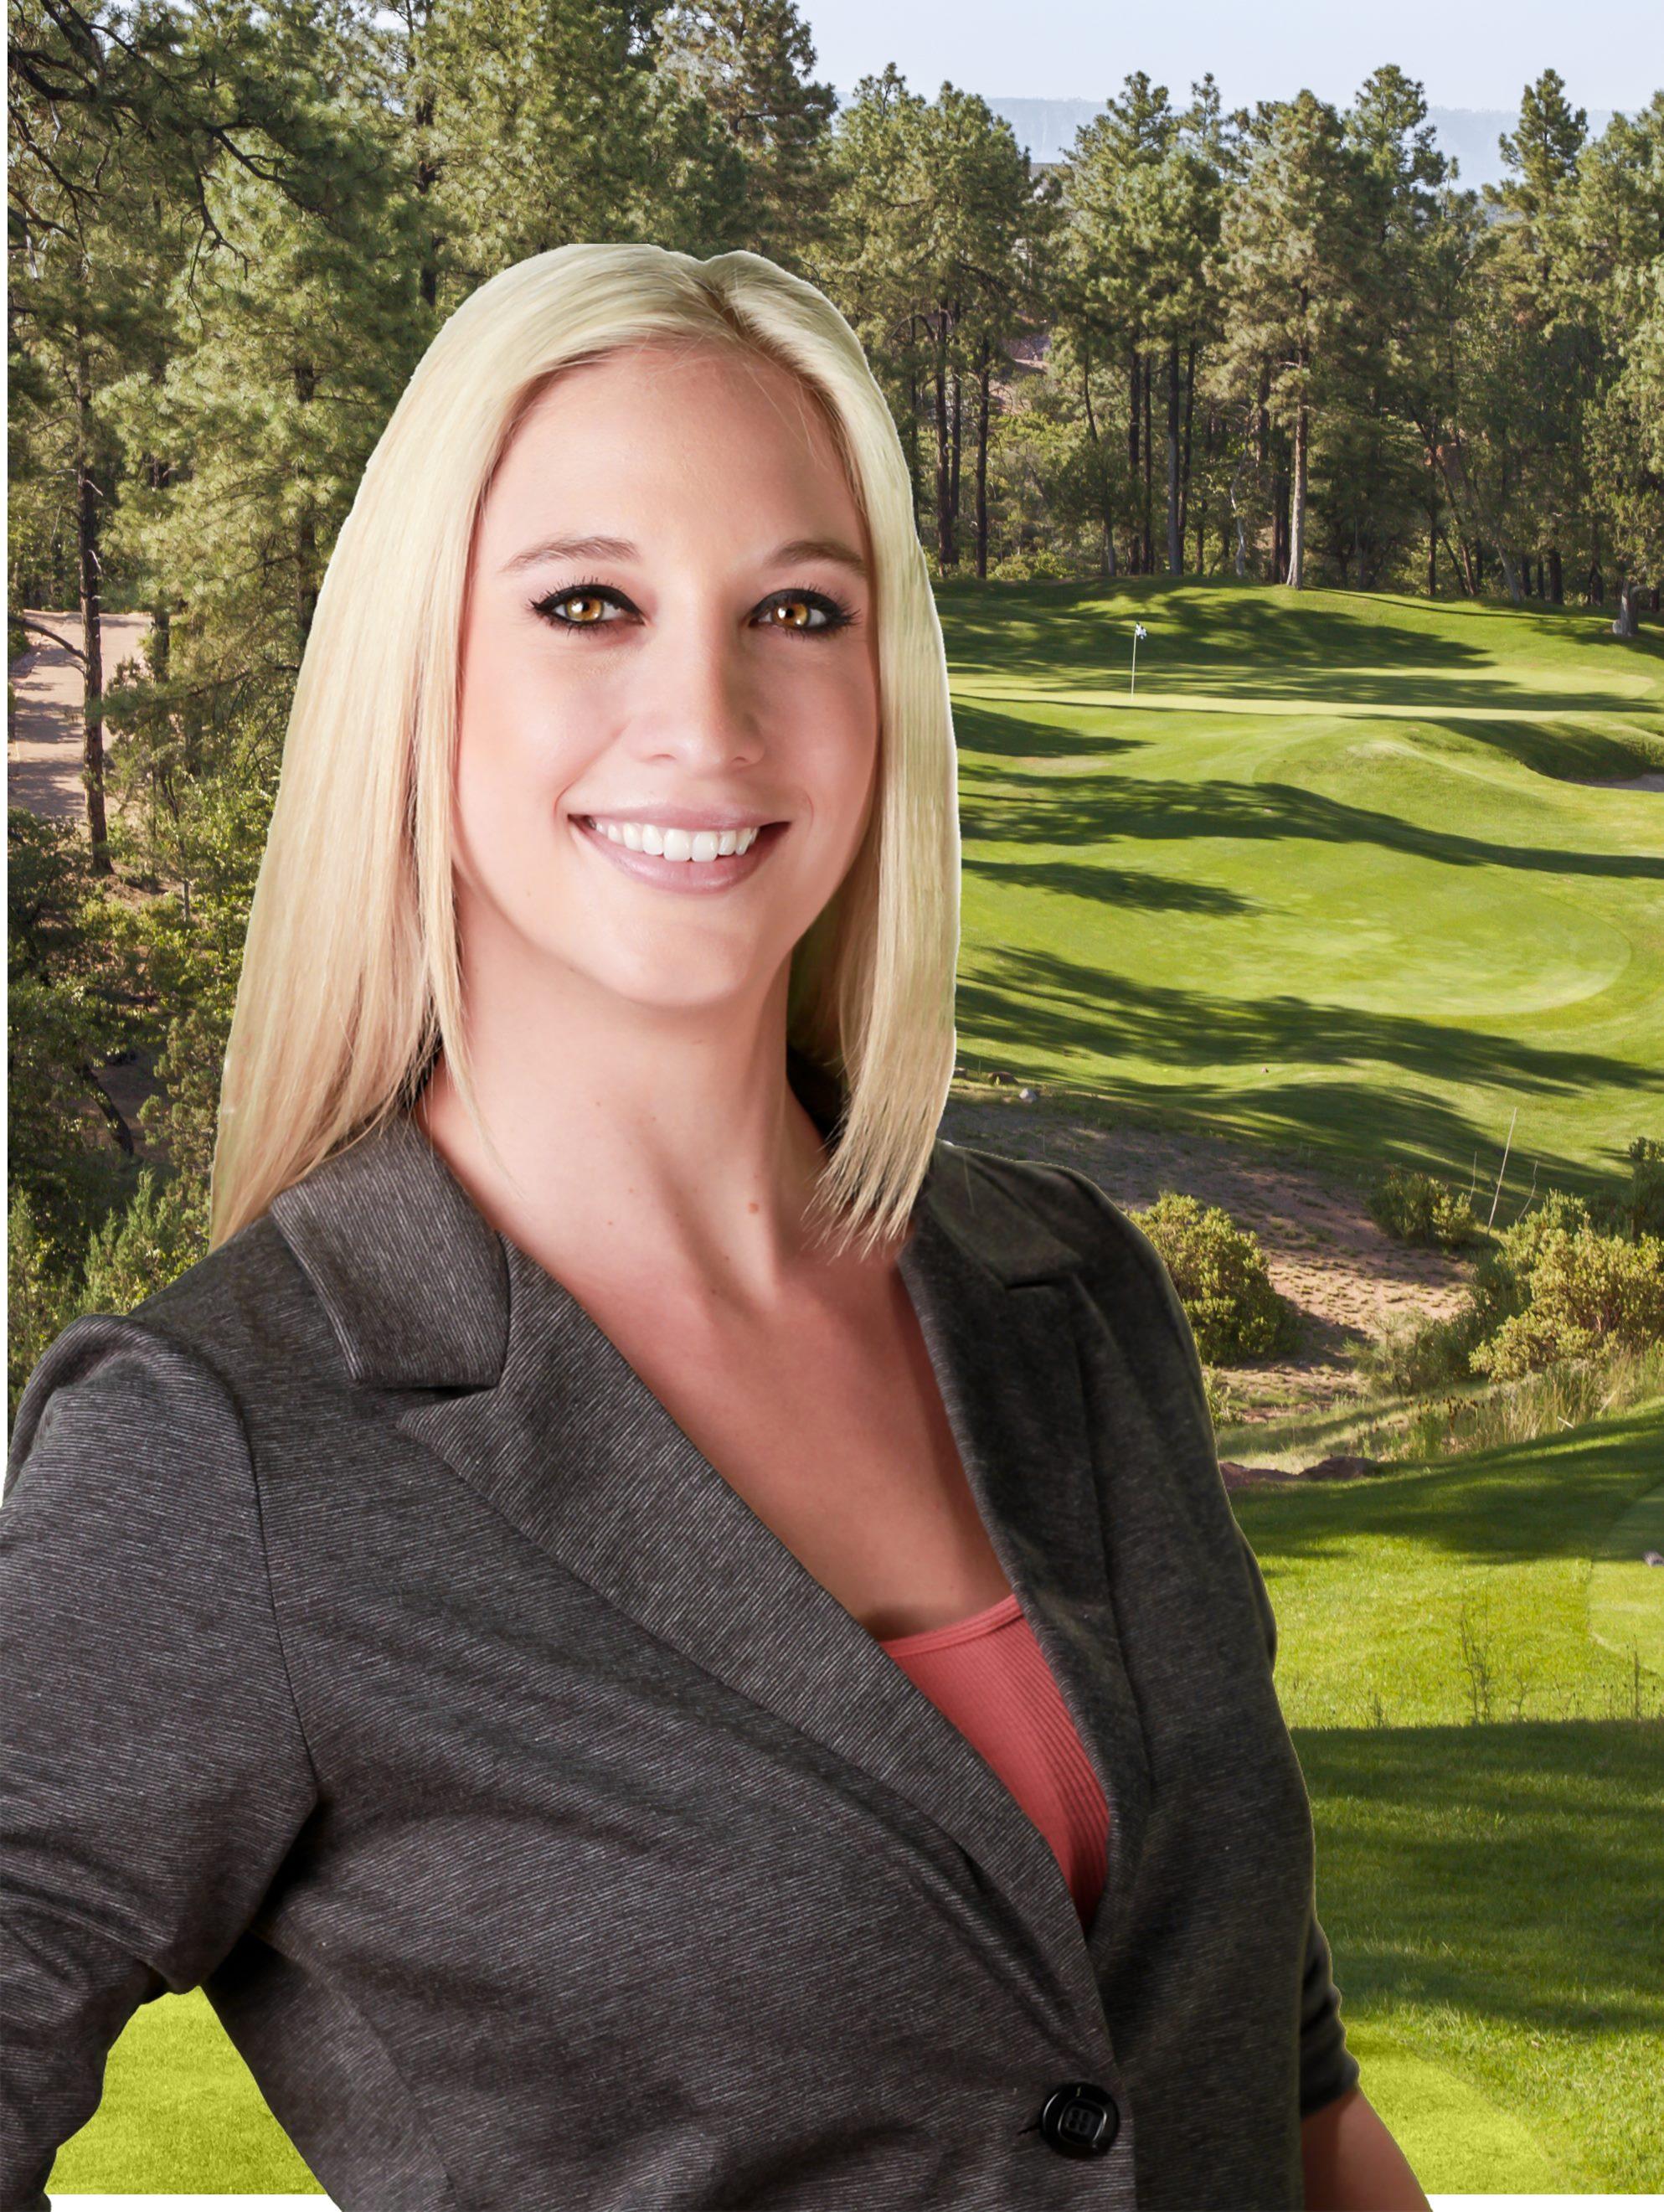 Stephanie Carlock